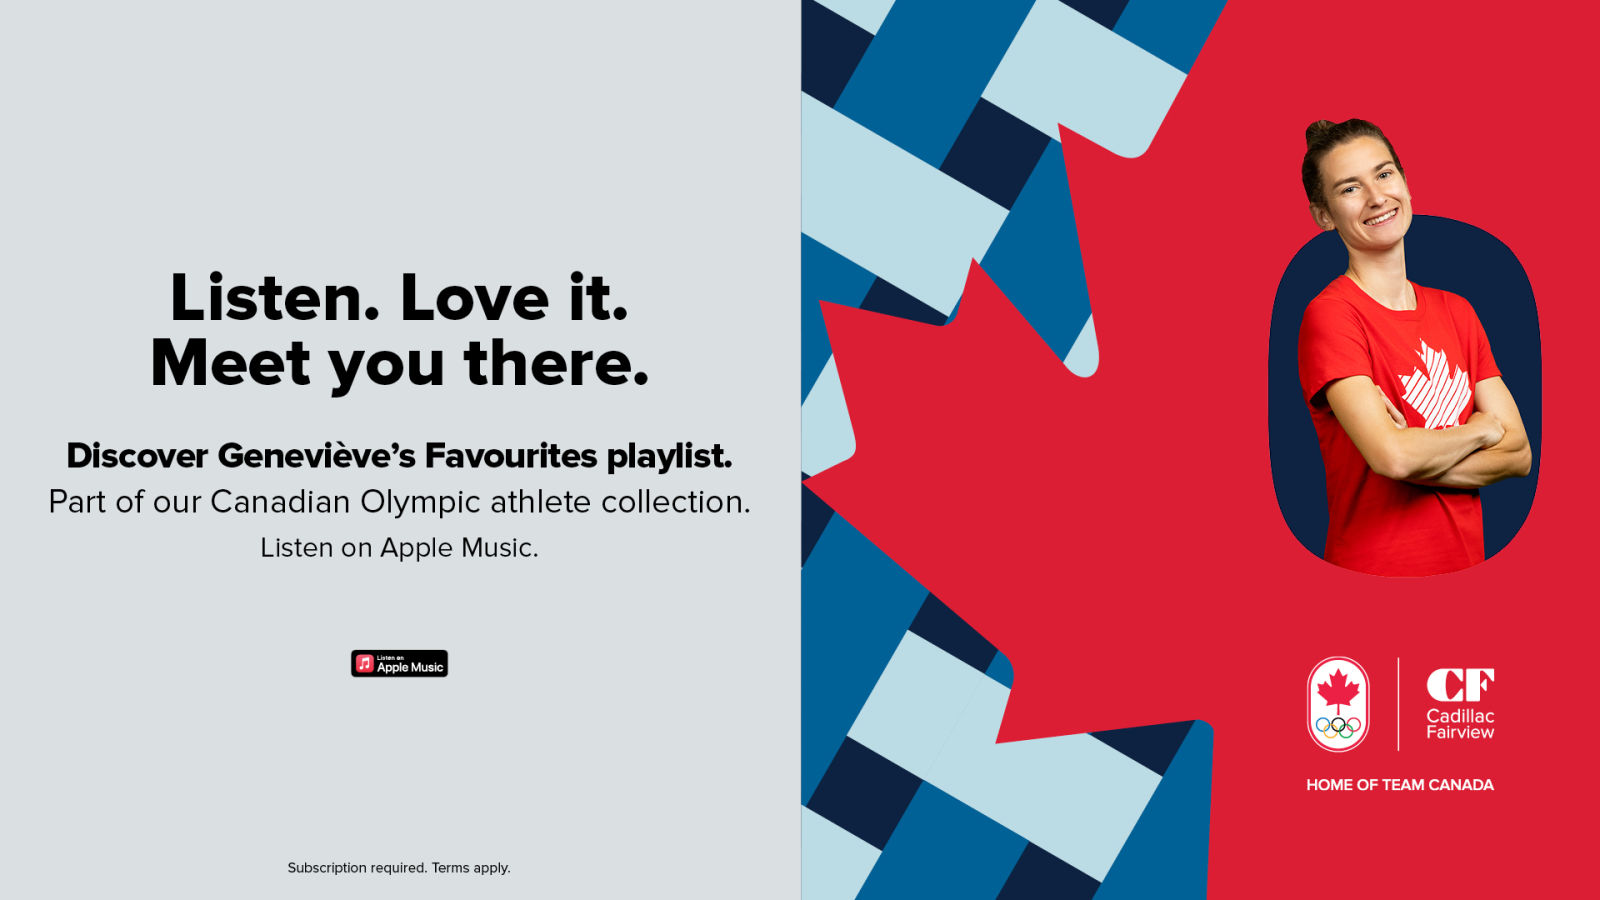 [CF Champlain] Geneviève Lalonde Apple Music Playlist